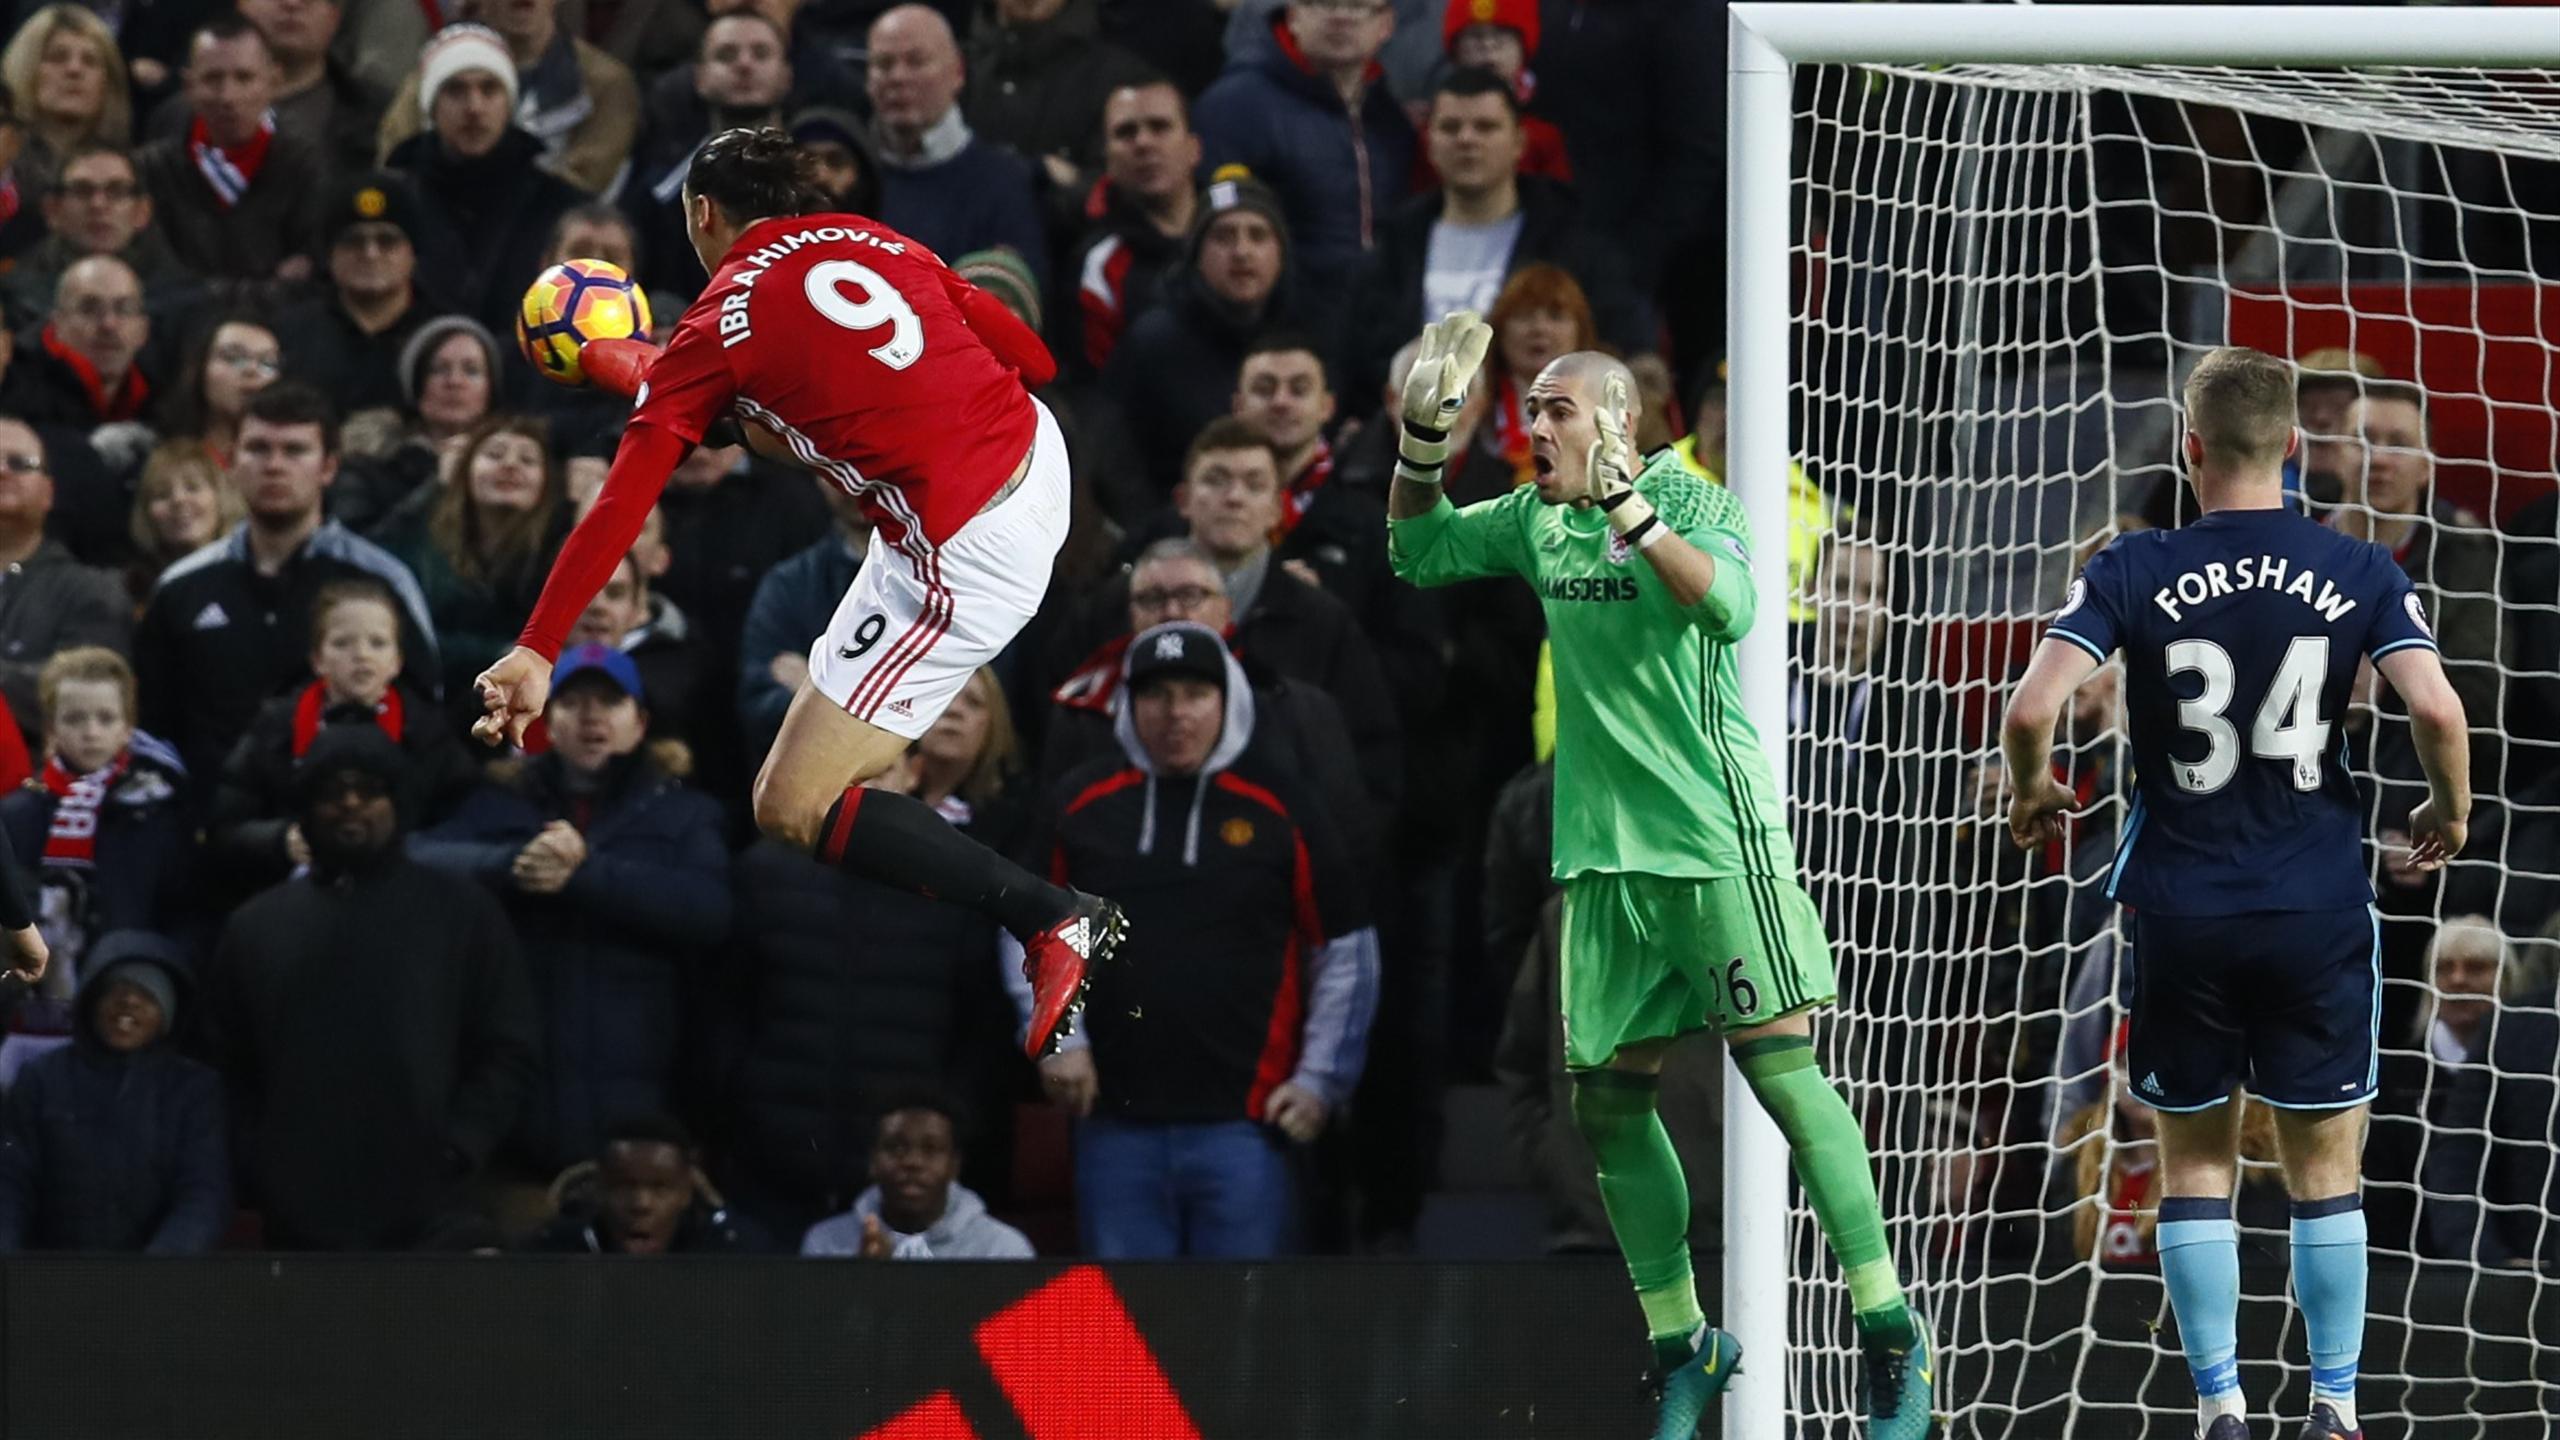 Zlatan Ibrahimovic has this goal disallowed against Middlesbrough